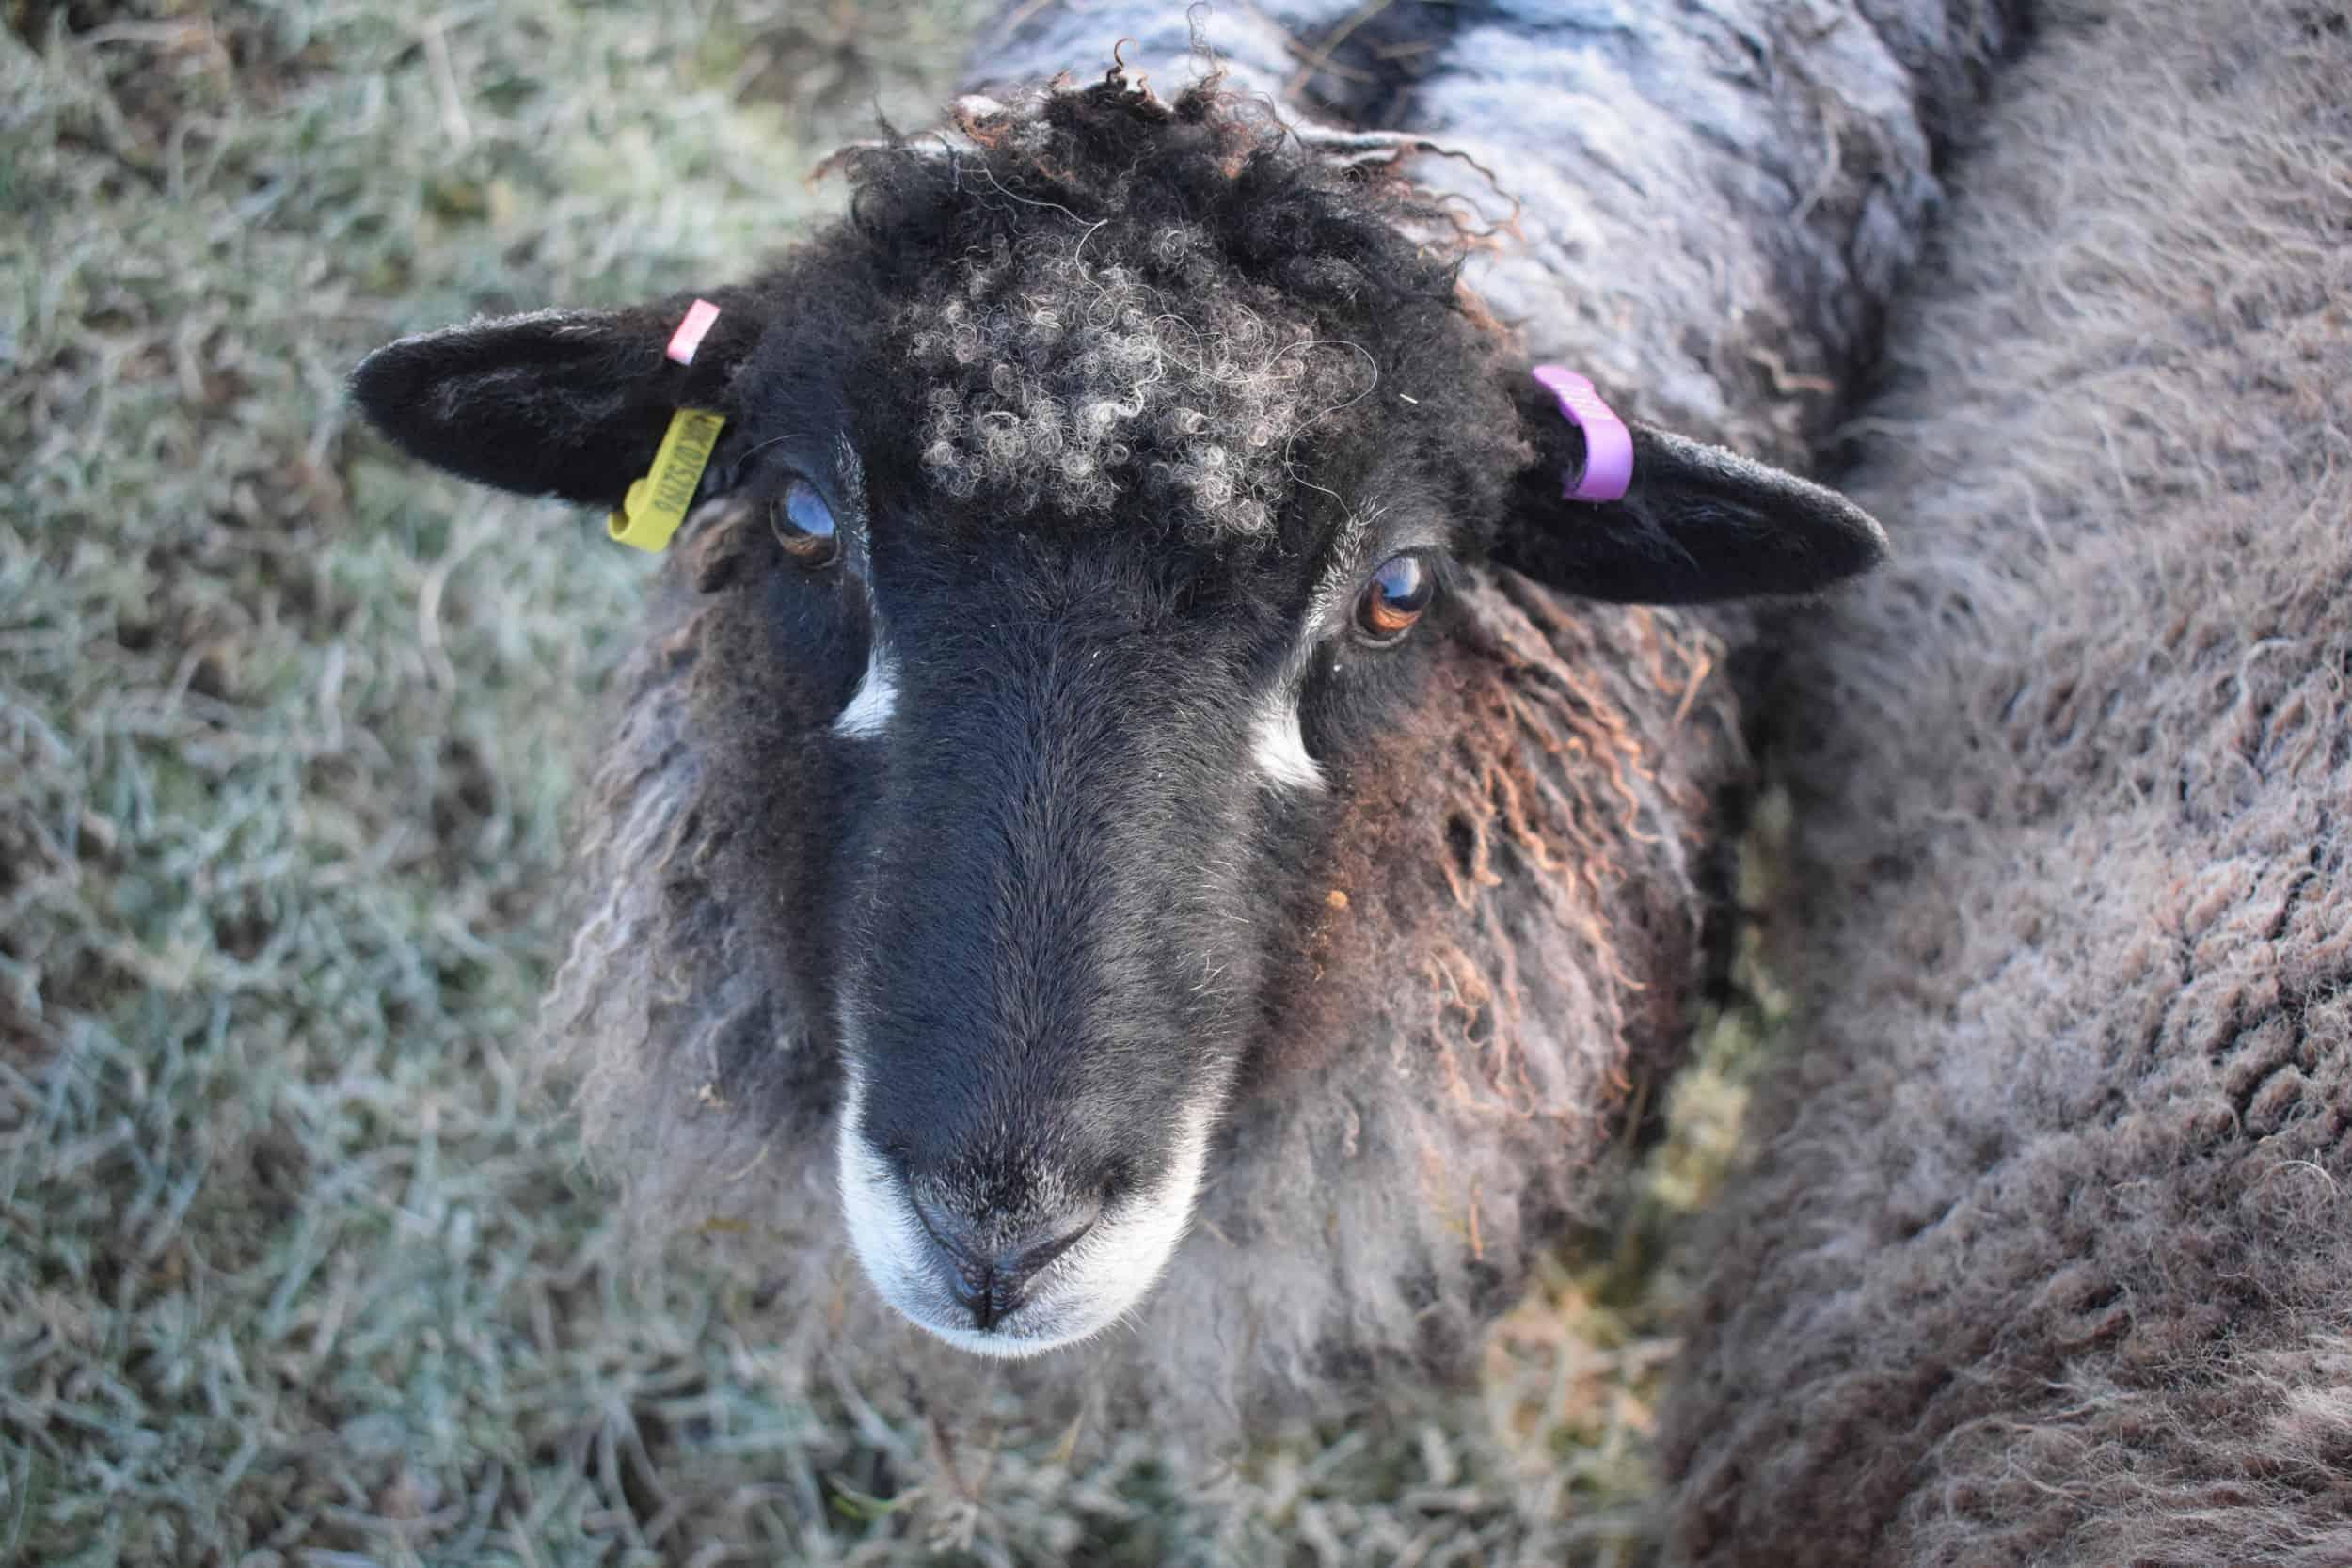 florence coloured leicester longwool gotland shetland sheep crossbreed english blue kind fibre 2